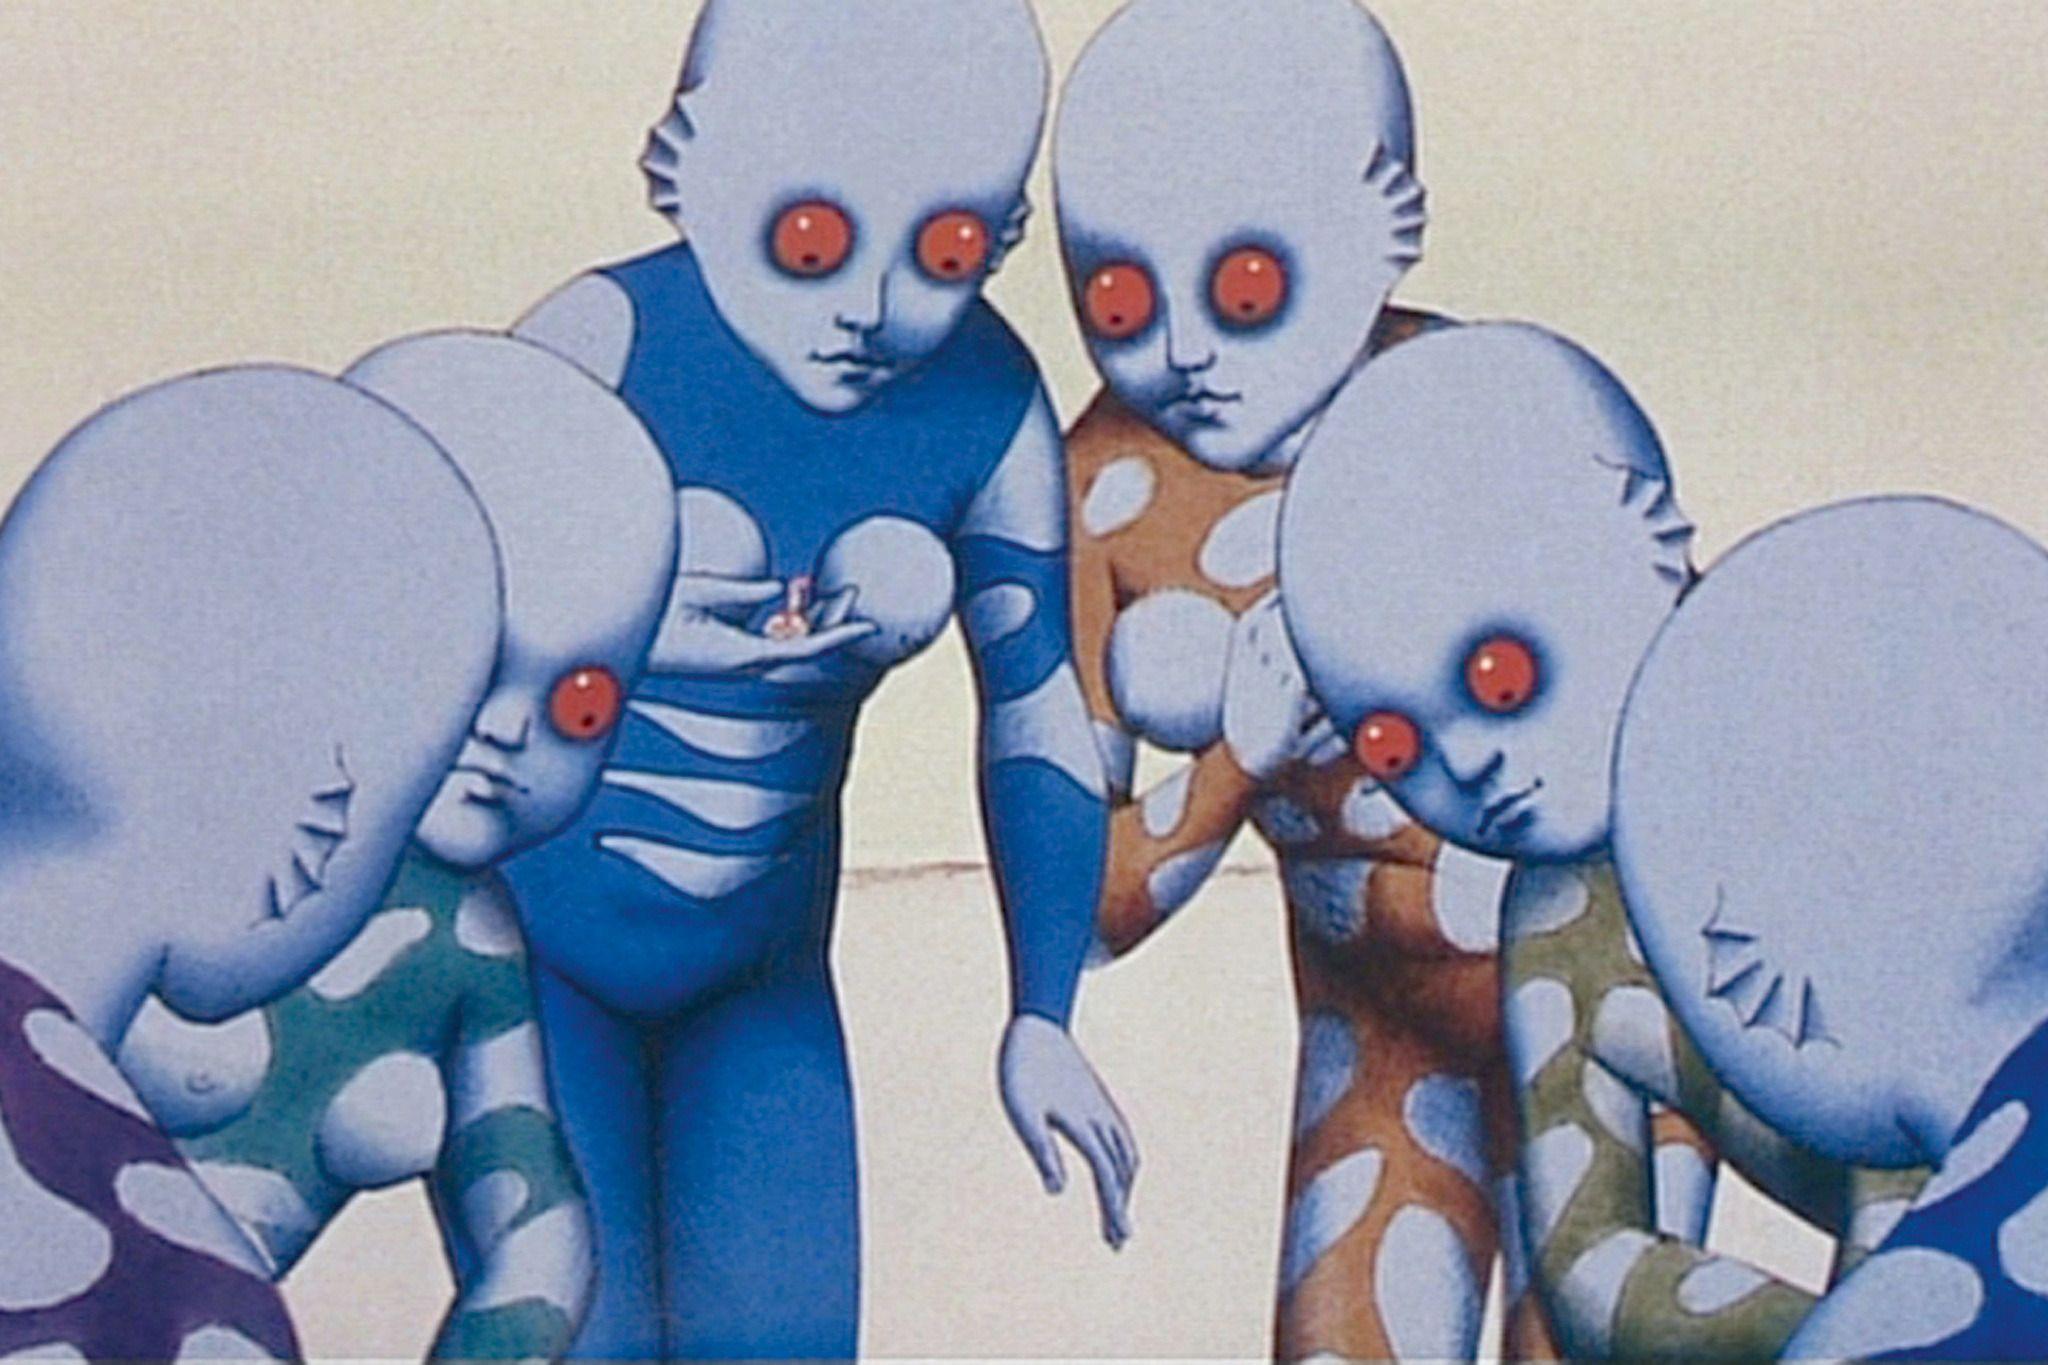 Fantastic 1973 animated movies animation 70s